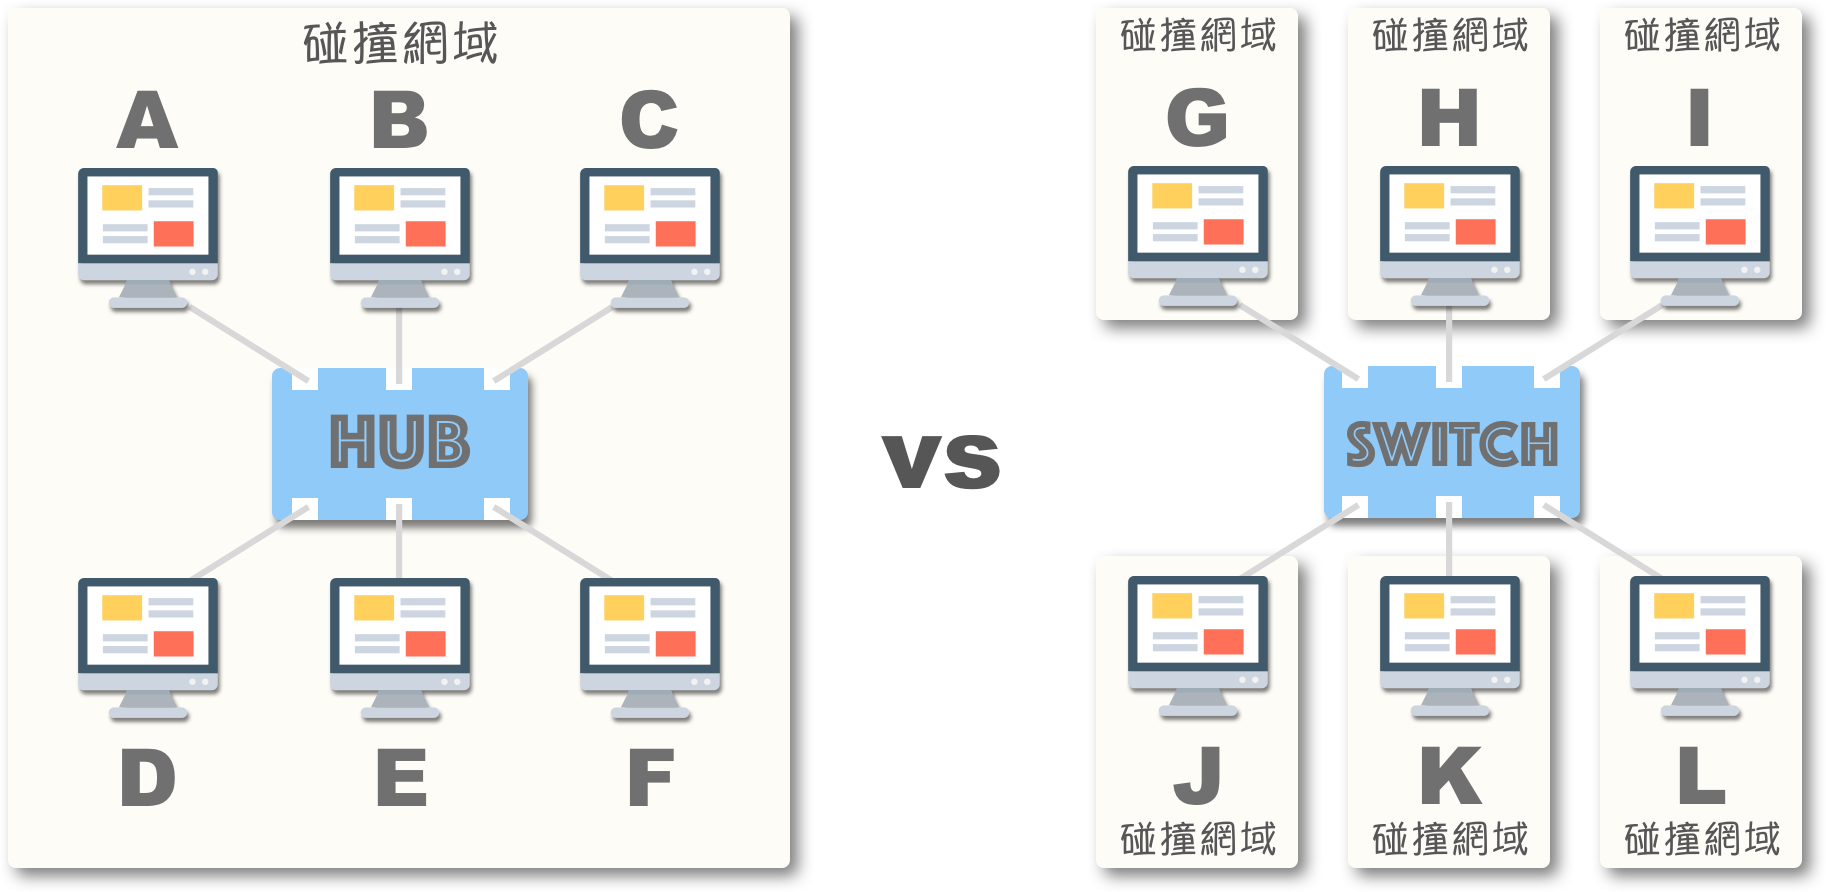 hub-vs-switch